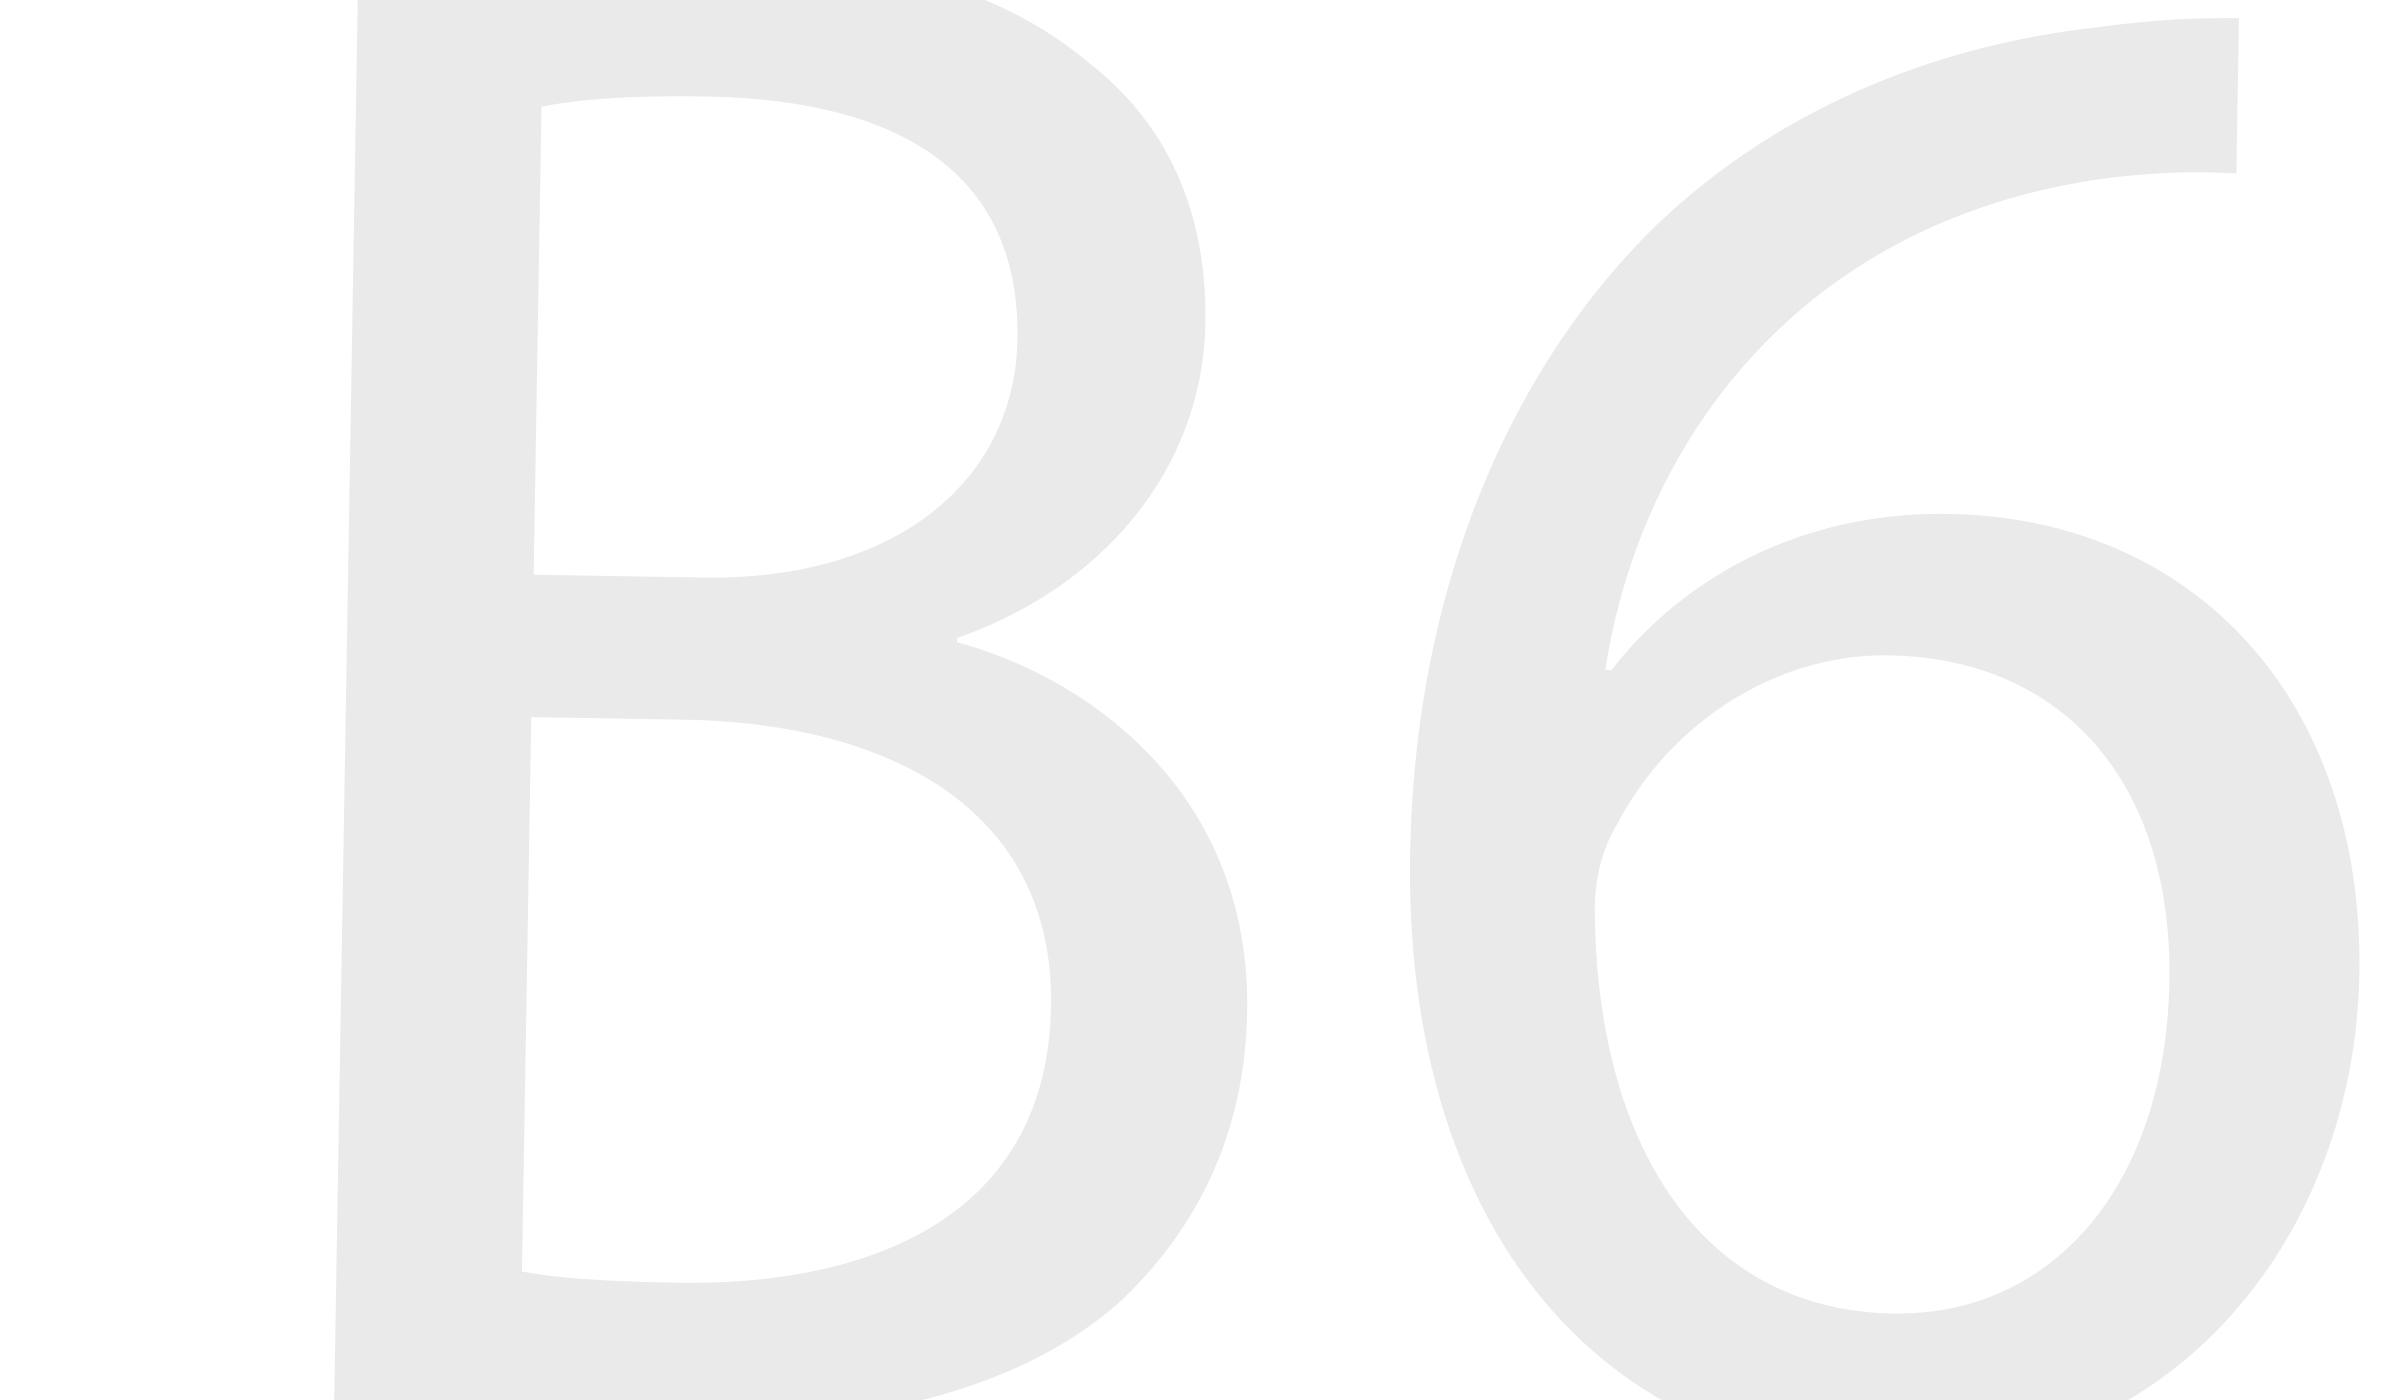 backb6